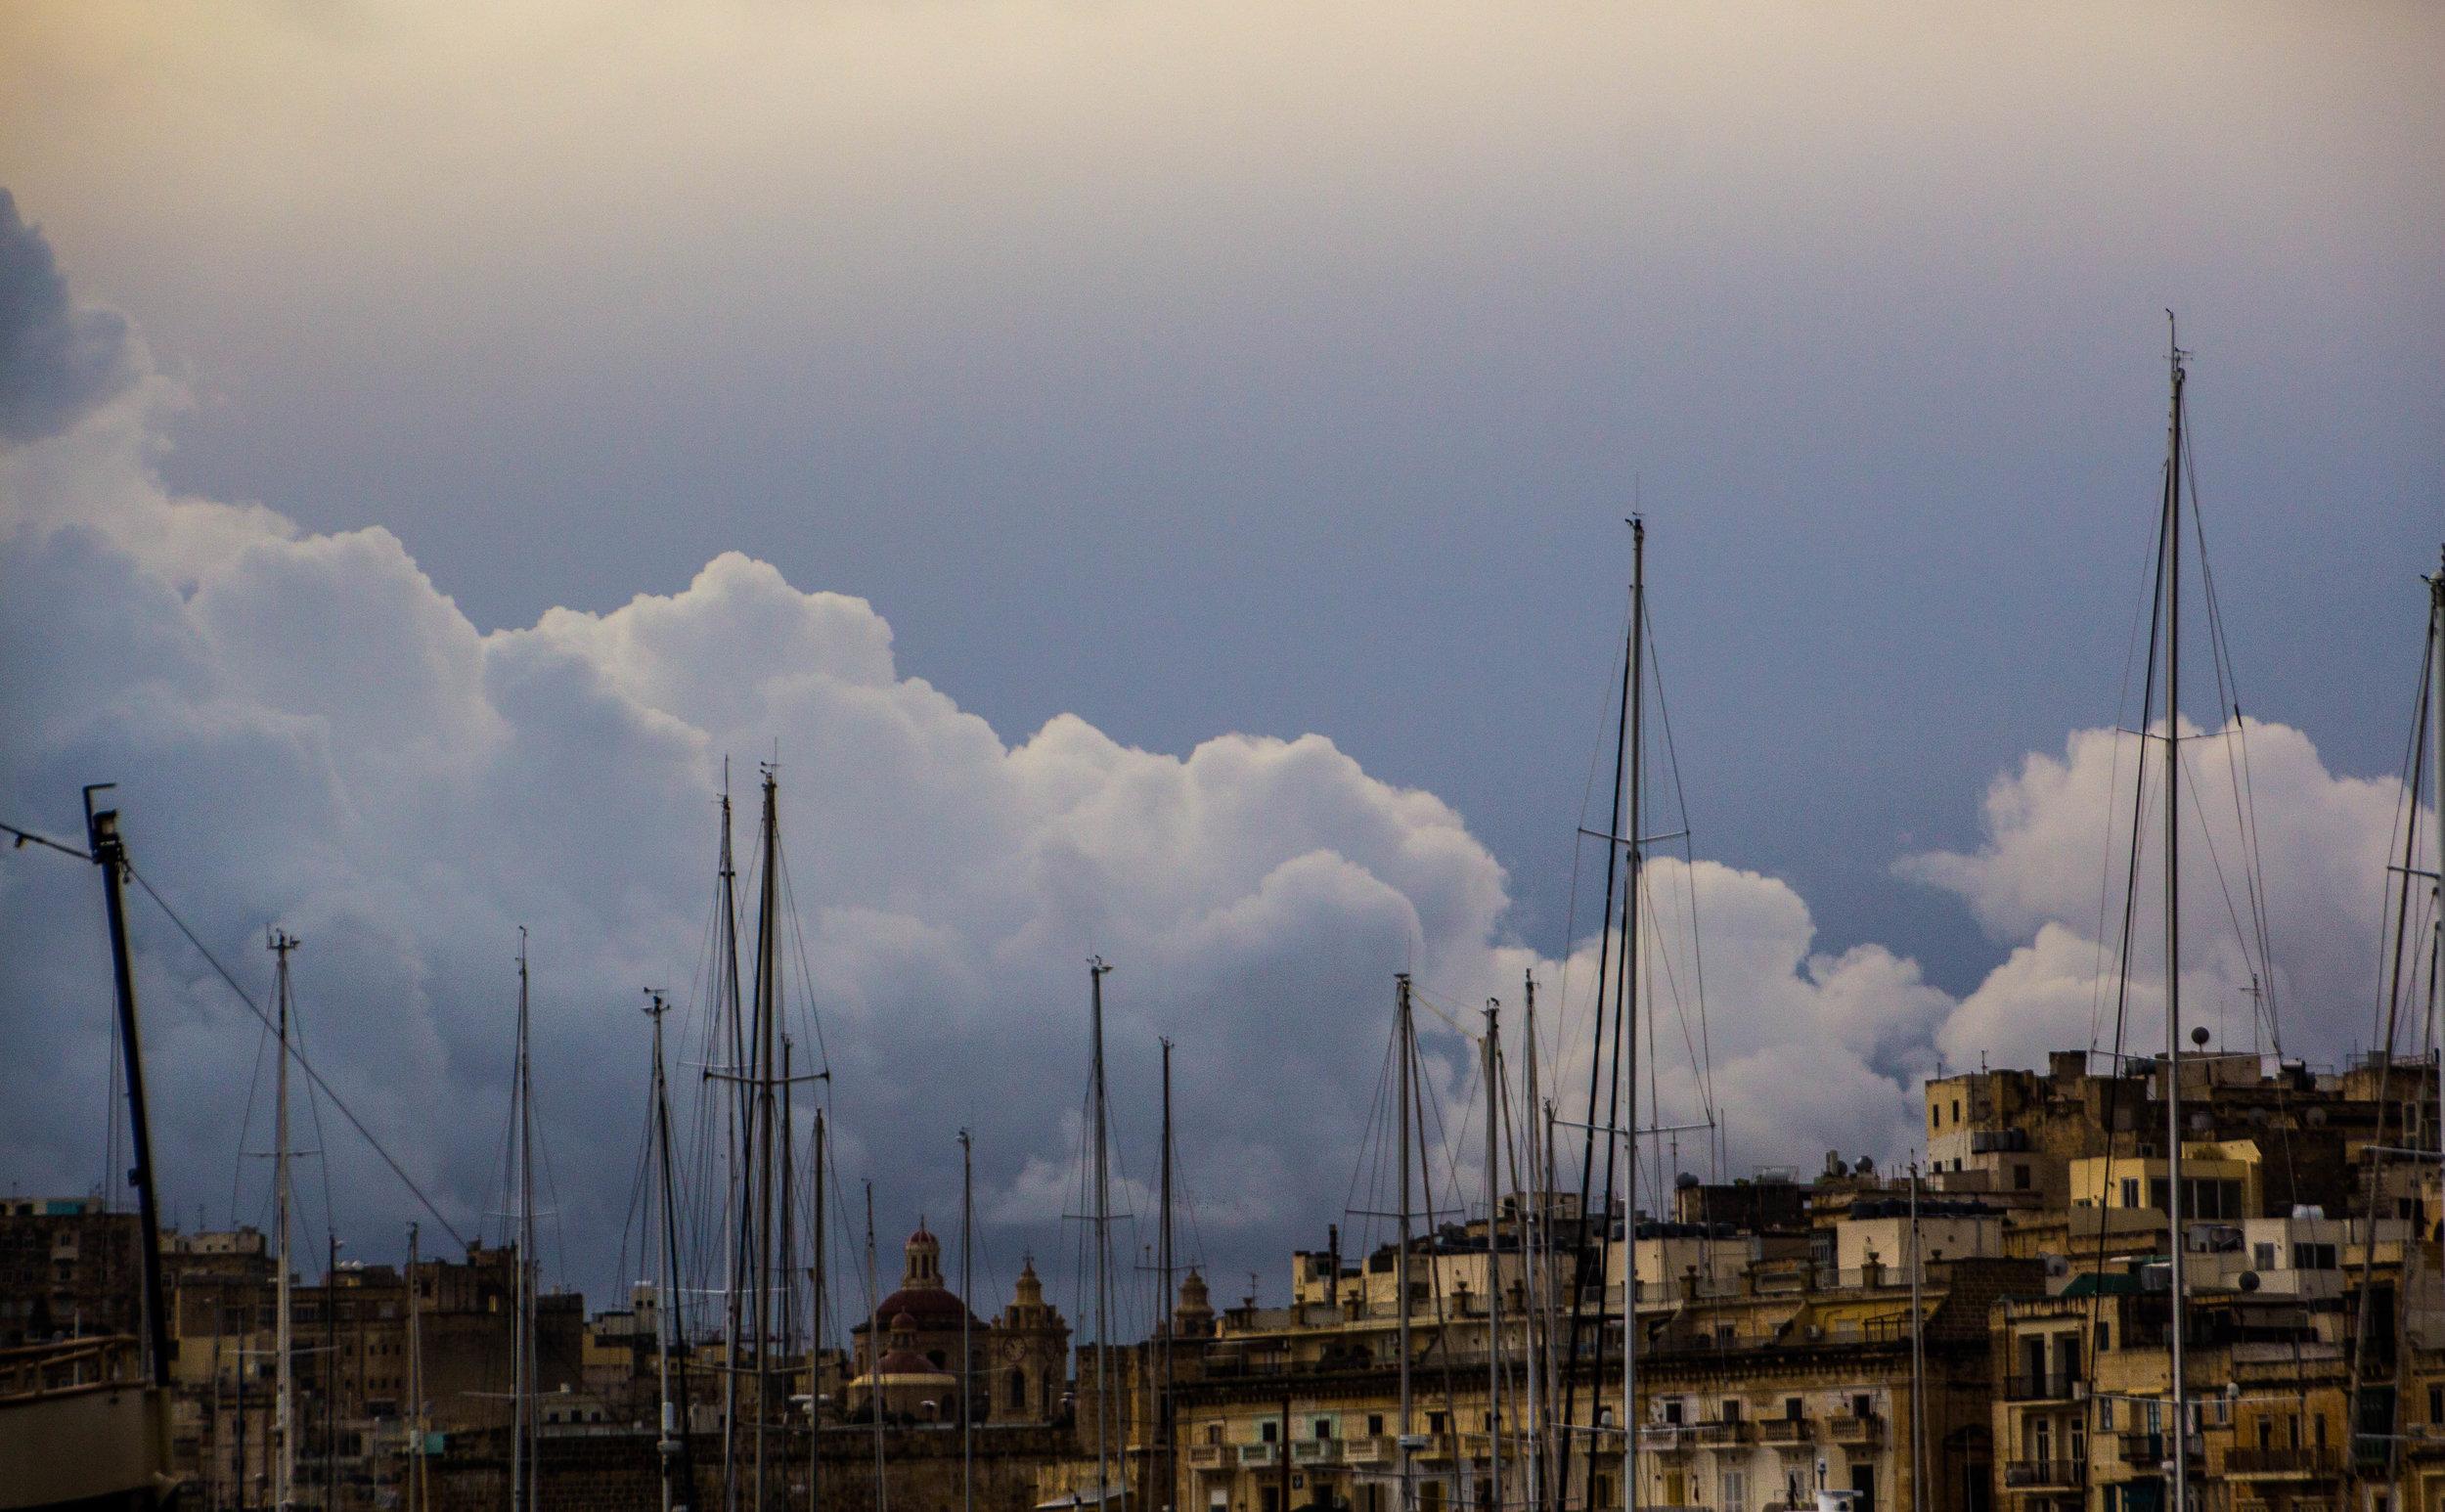 birgu-sunrise-photography-valletta-malta-32.jpg